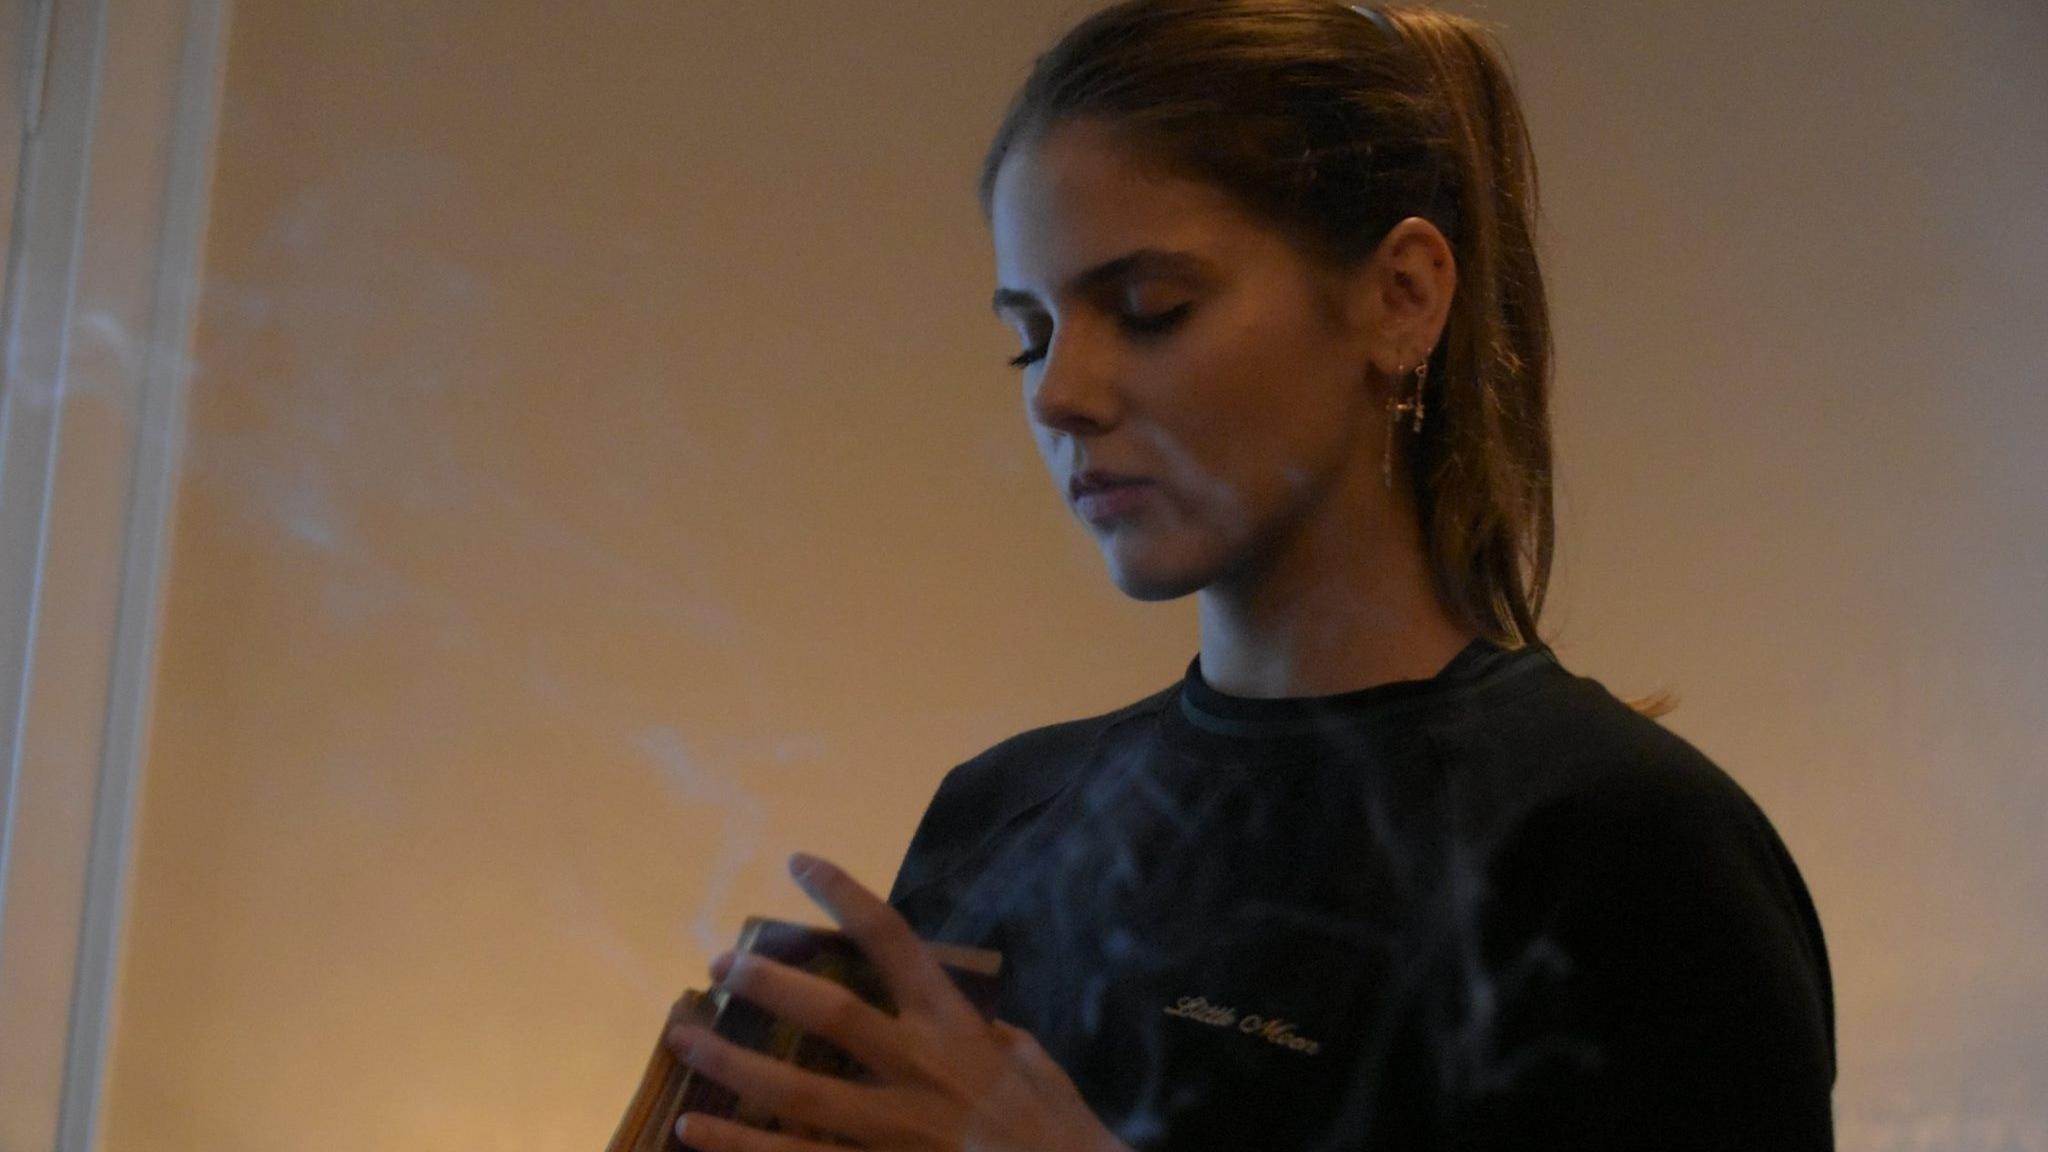 ANITA PRESNYAK - POST PRODUCTION SOUND